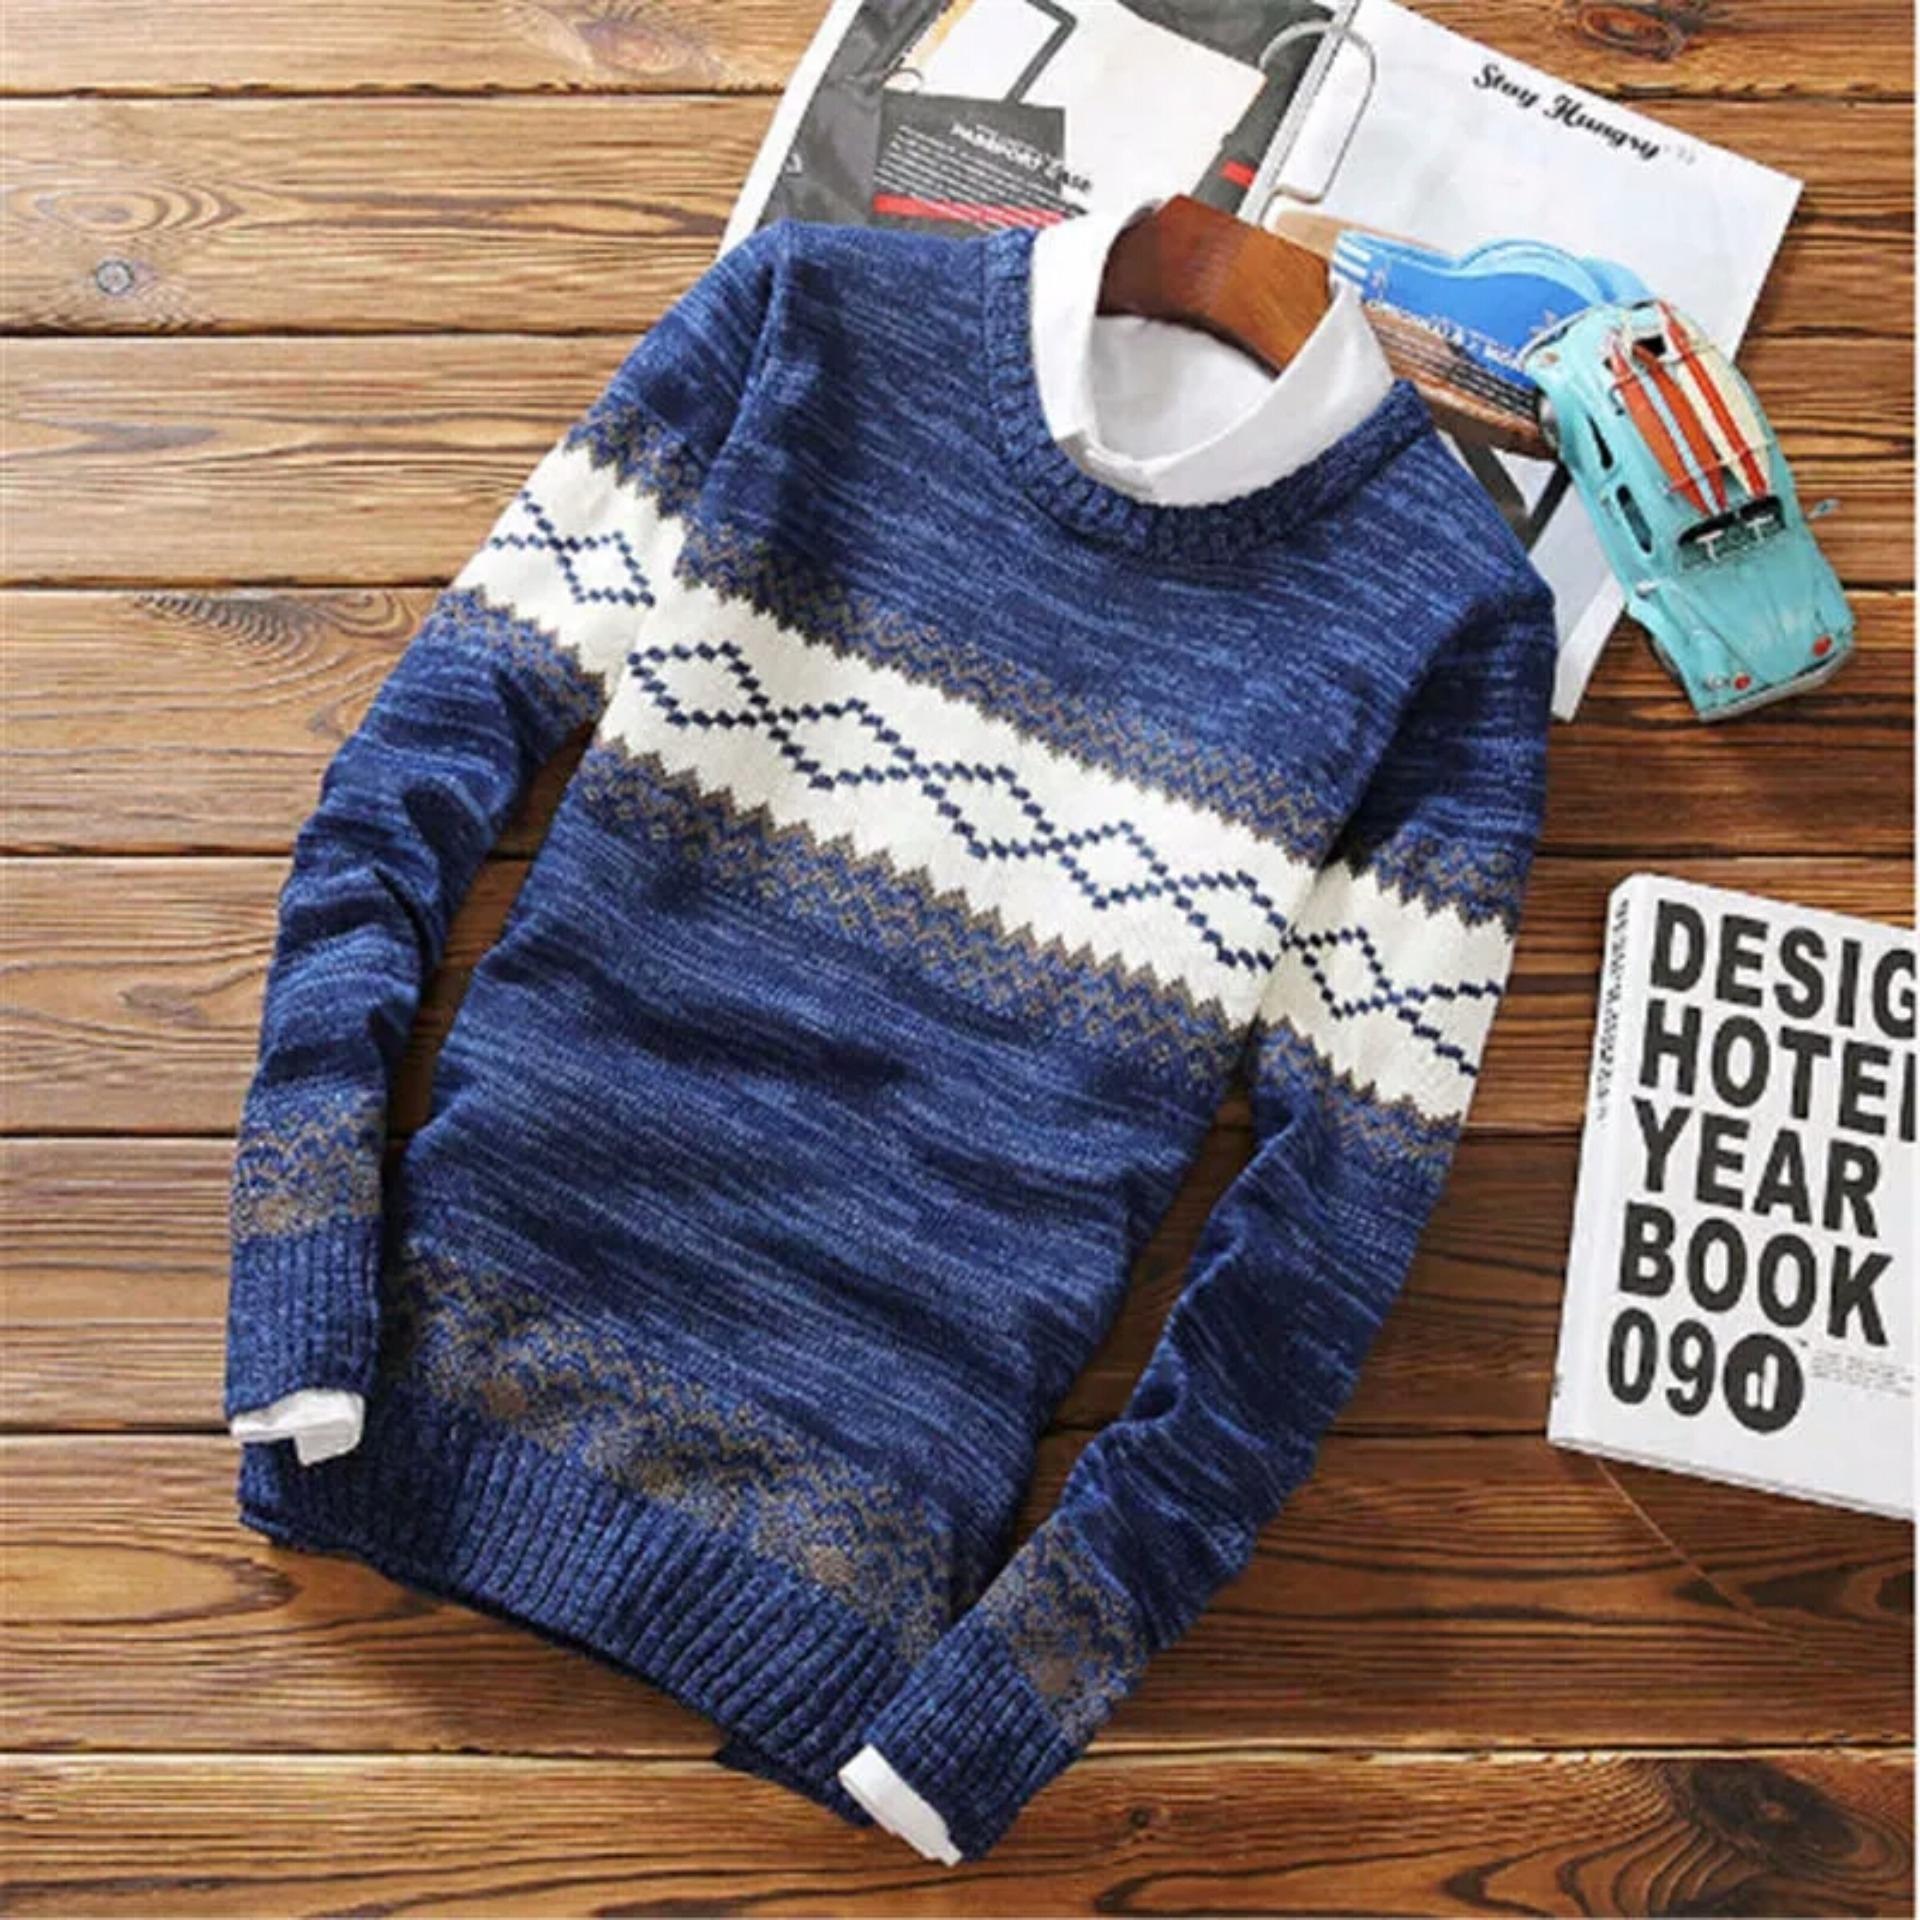 Buy Sell Cheapest Rajut Pria Murah Best Quality Product Deals Sweater Azuma Navy Wildan Twist Baju Atasan Remaja